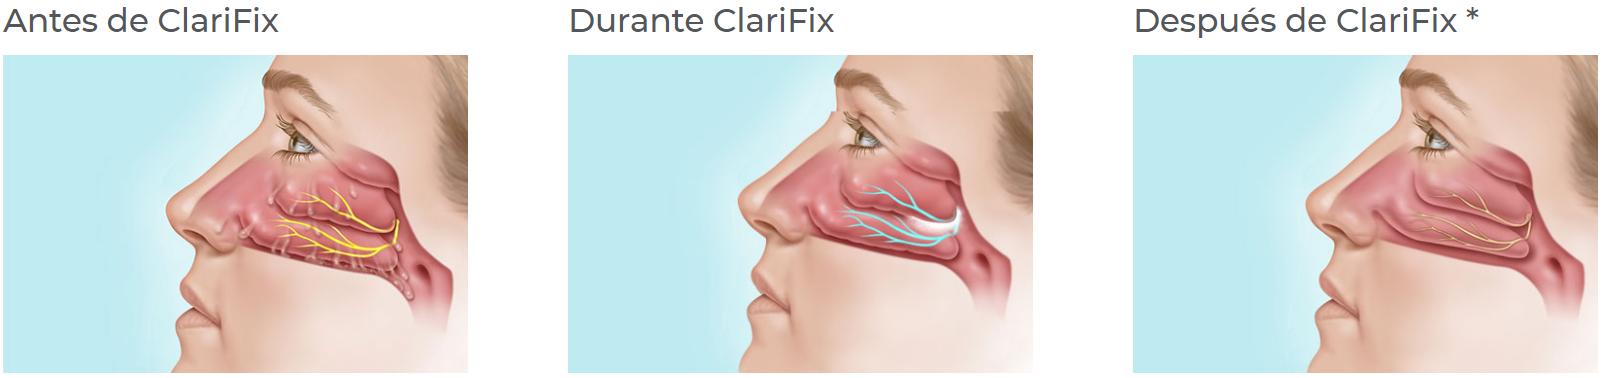 clarifix rinitis crónica